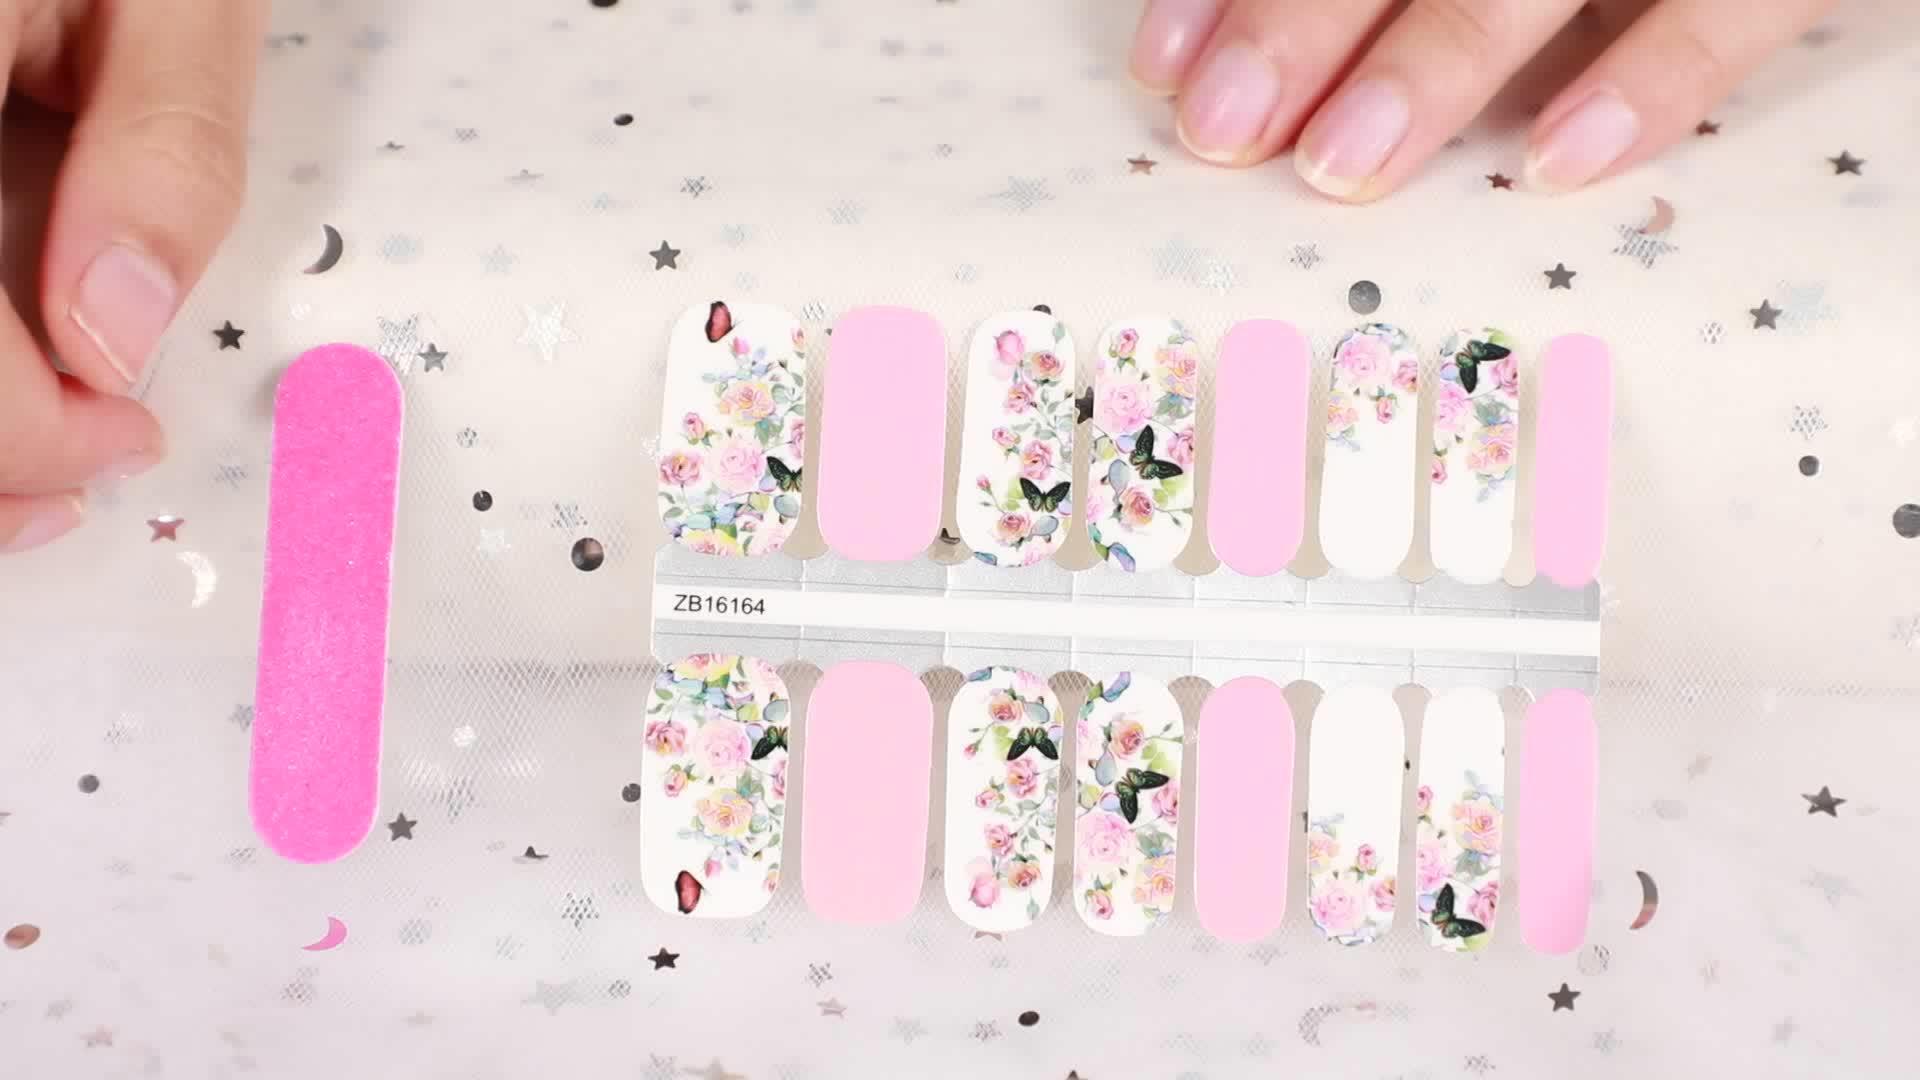 Laatste Volledige Cover Famous Brand Nagellak Sticker Marmeren Nail Art Design wraps, Nail strips